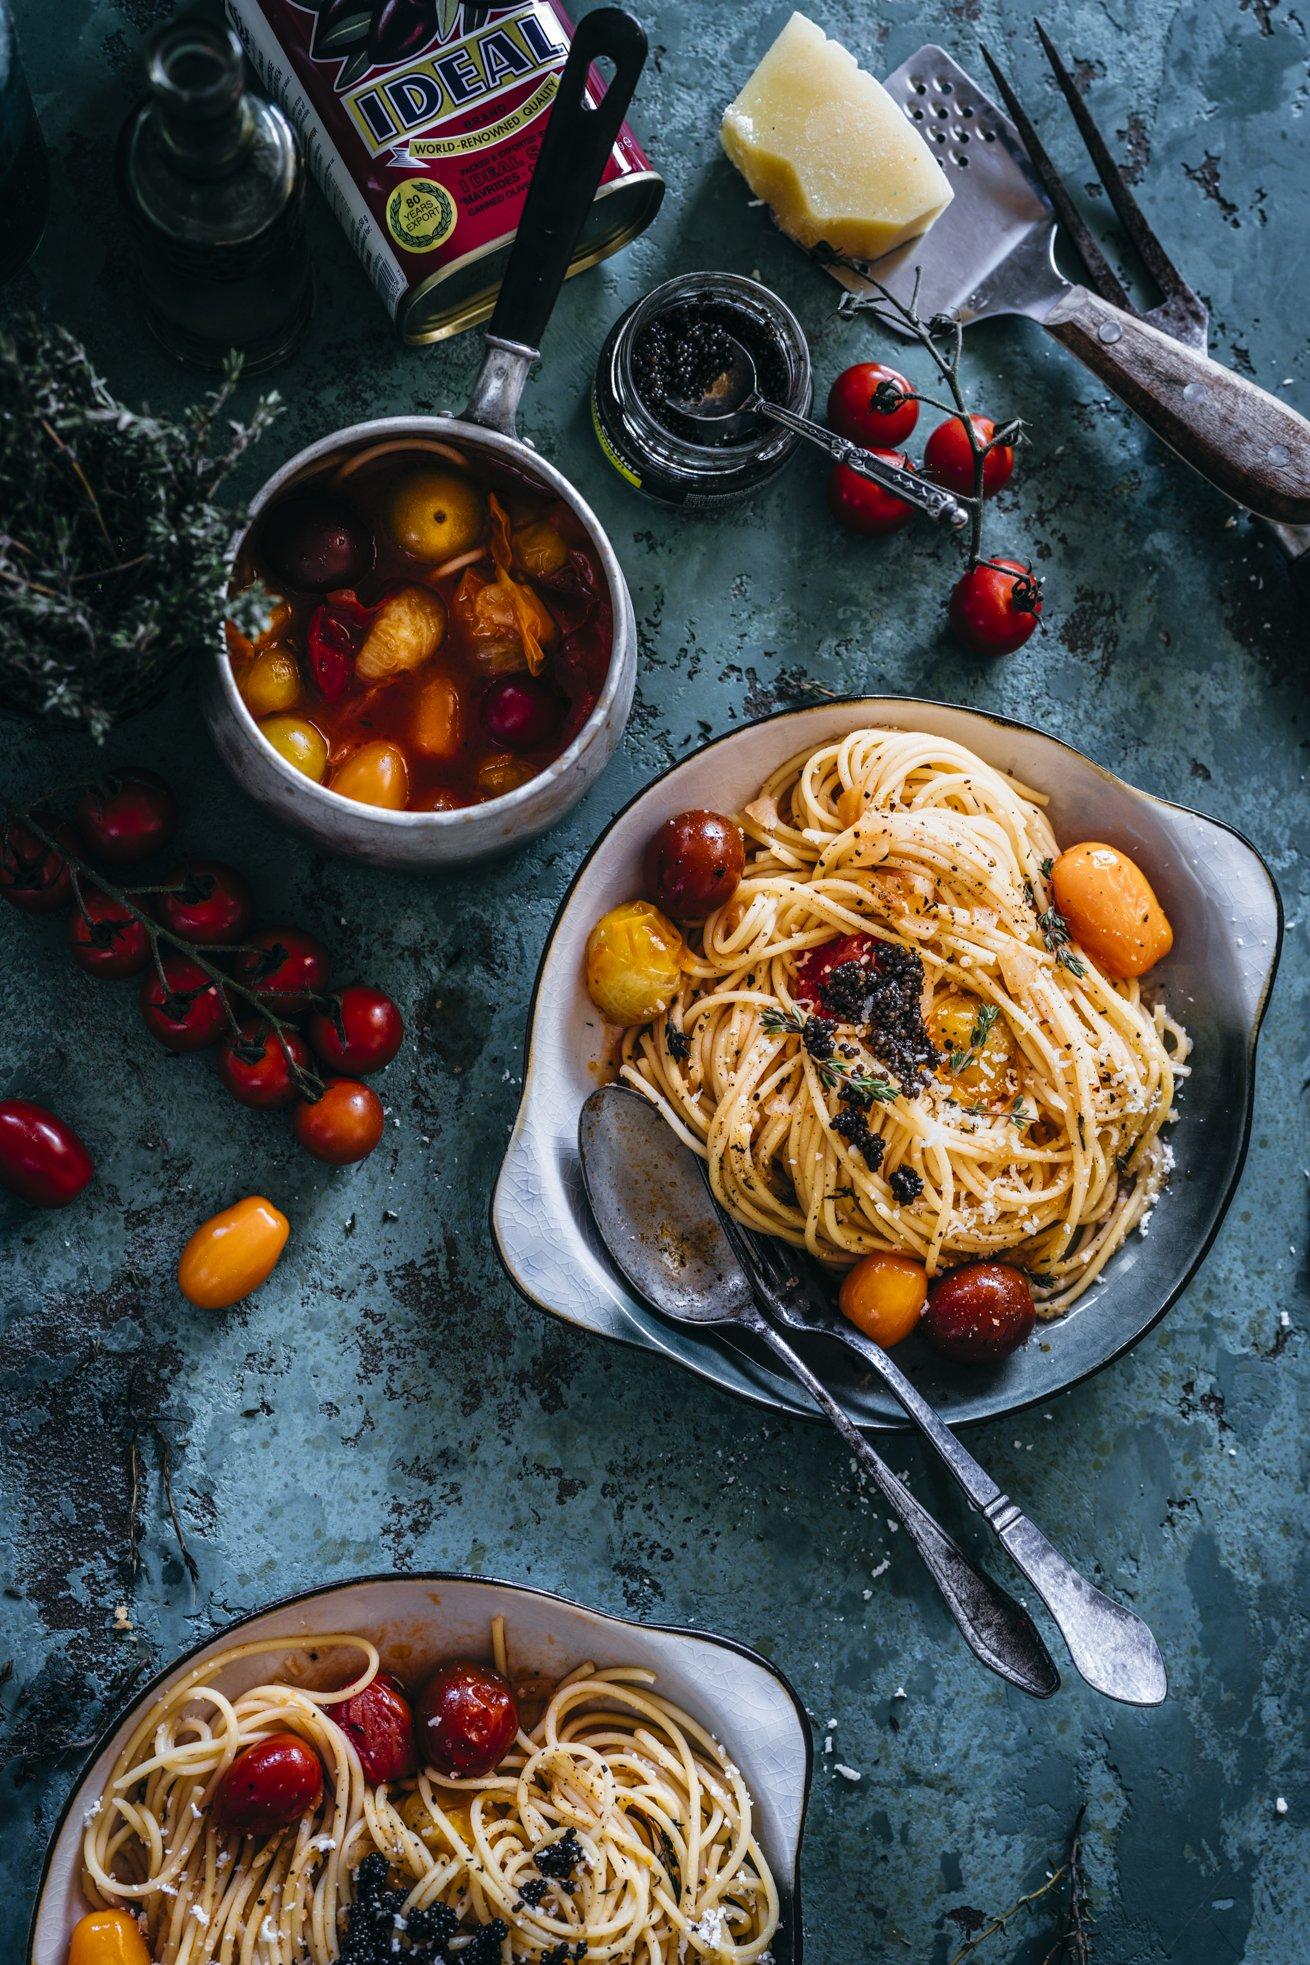 Tolles Spaghetti Rezept mit Tomaten Gin Sauce